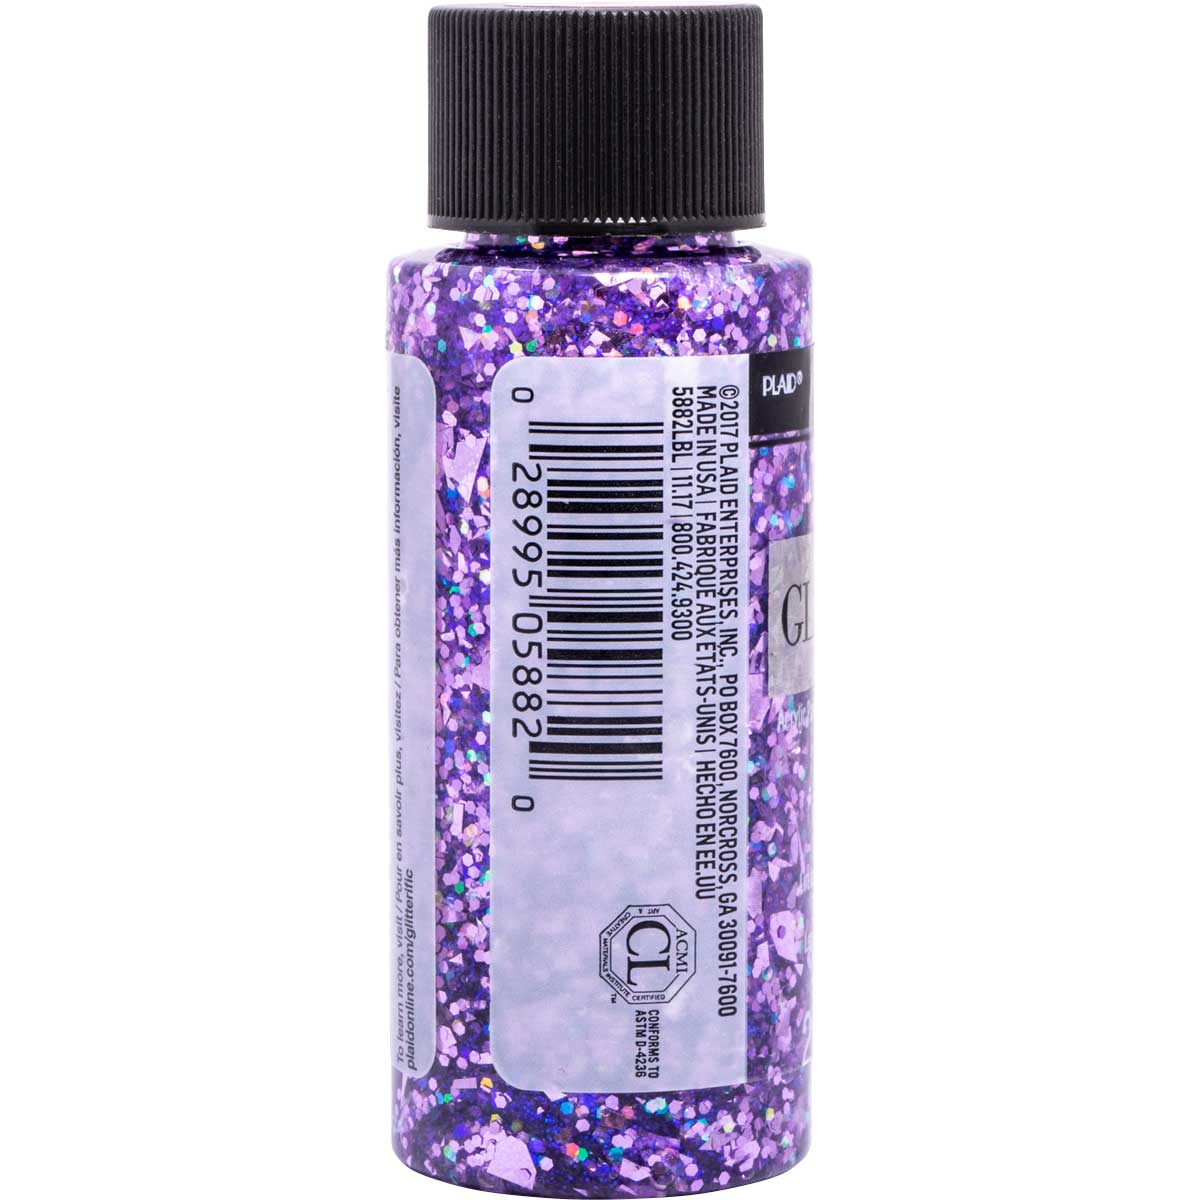 FolkArt ® Glitterific™ Acrylic Paint - Purple, 2 oz. - 5882